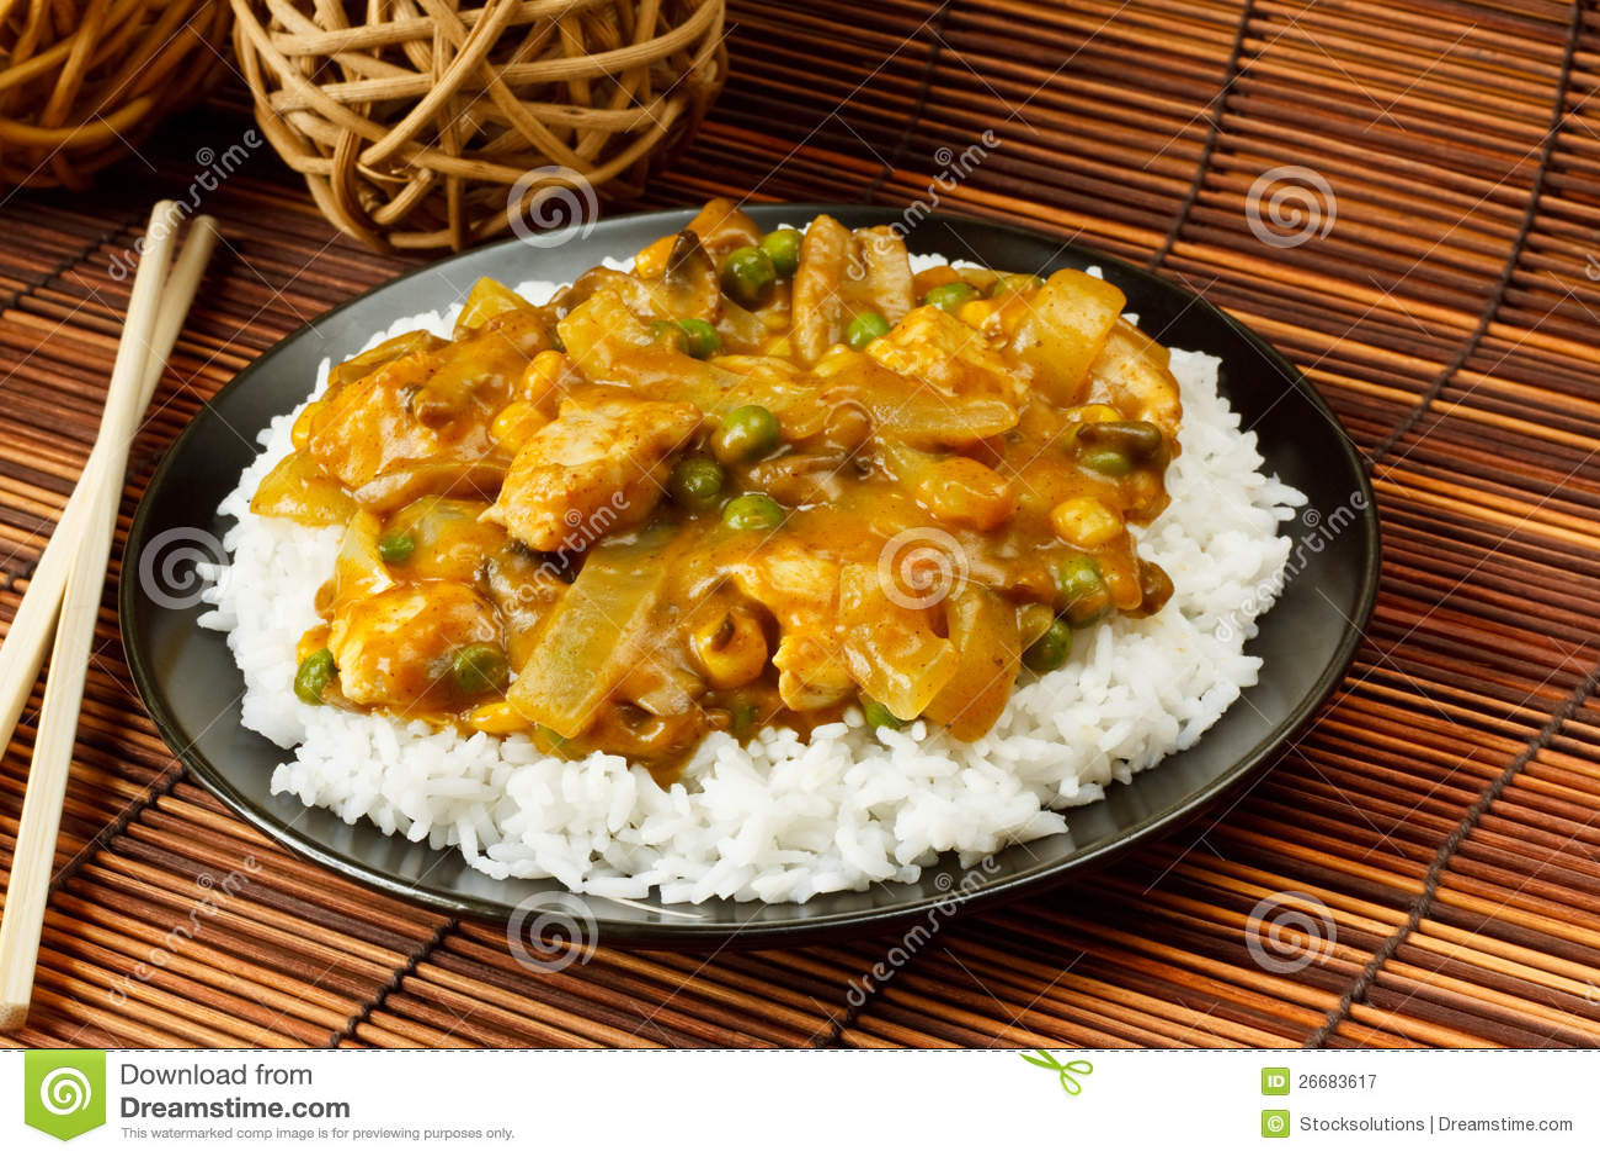 Feg curry